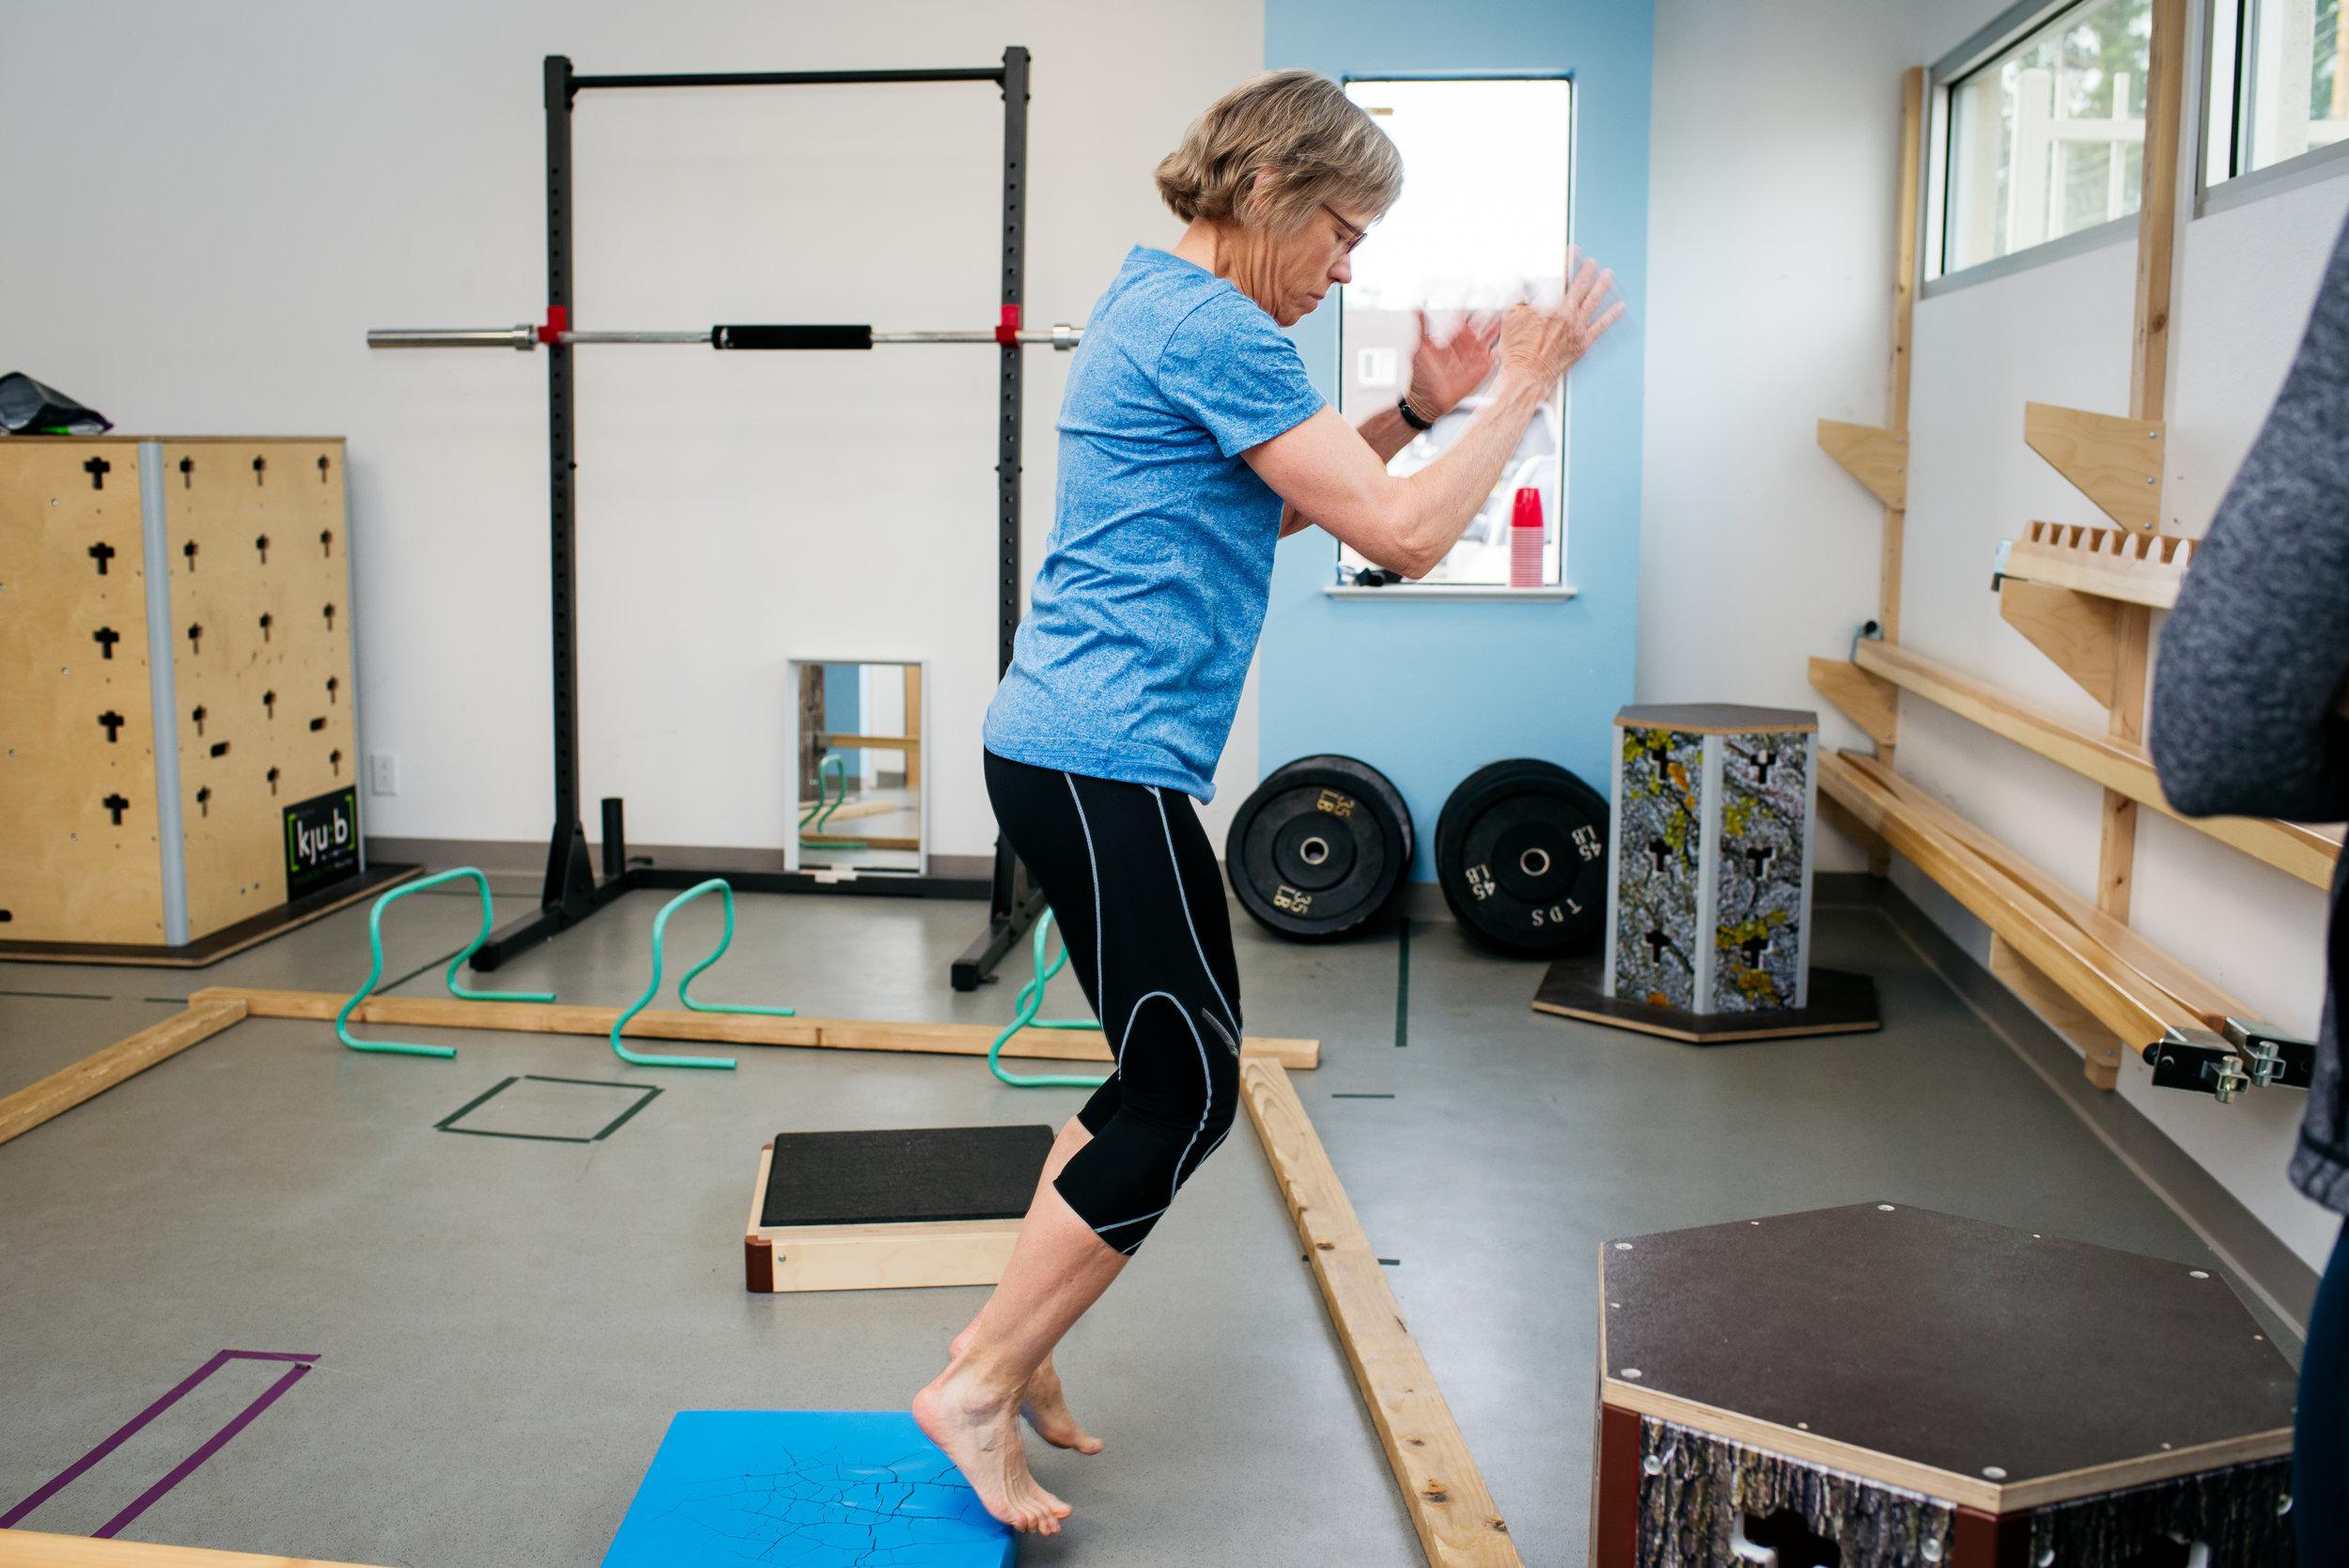 Lynn MovNat precision jump MoveTru Albuquerque